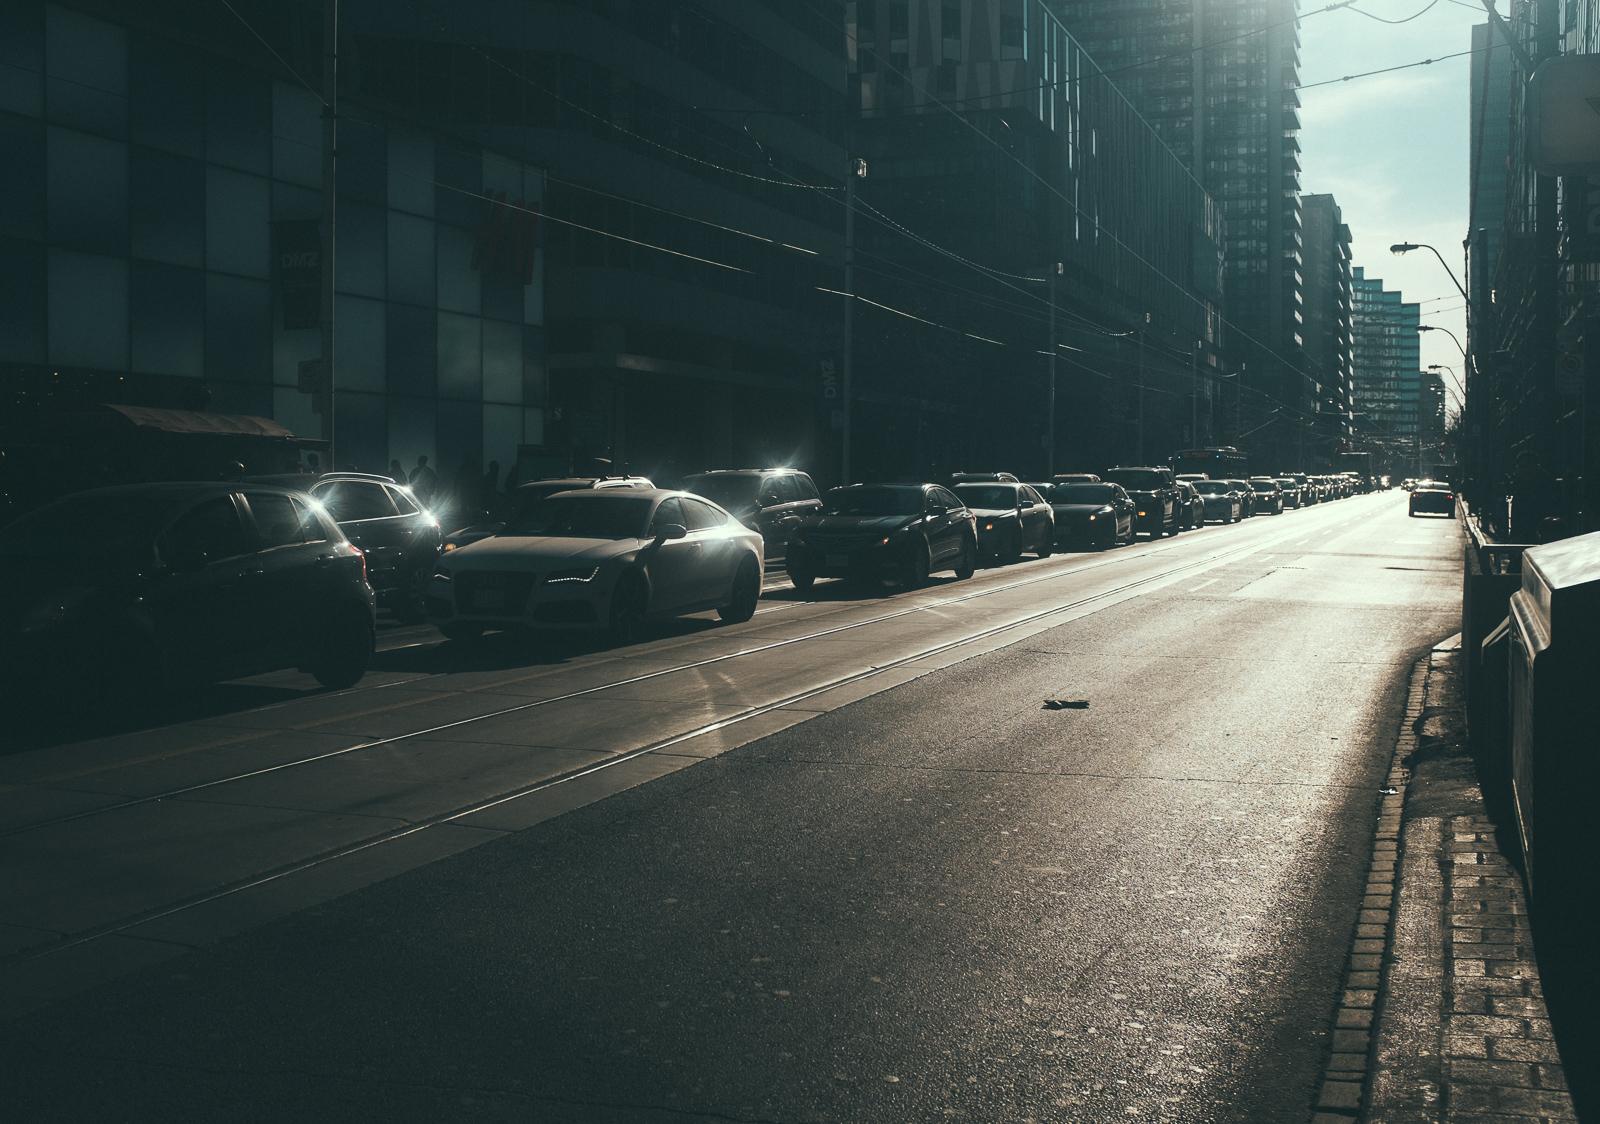 toronto_street-10.jpg